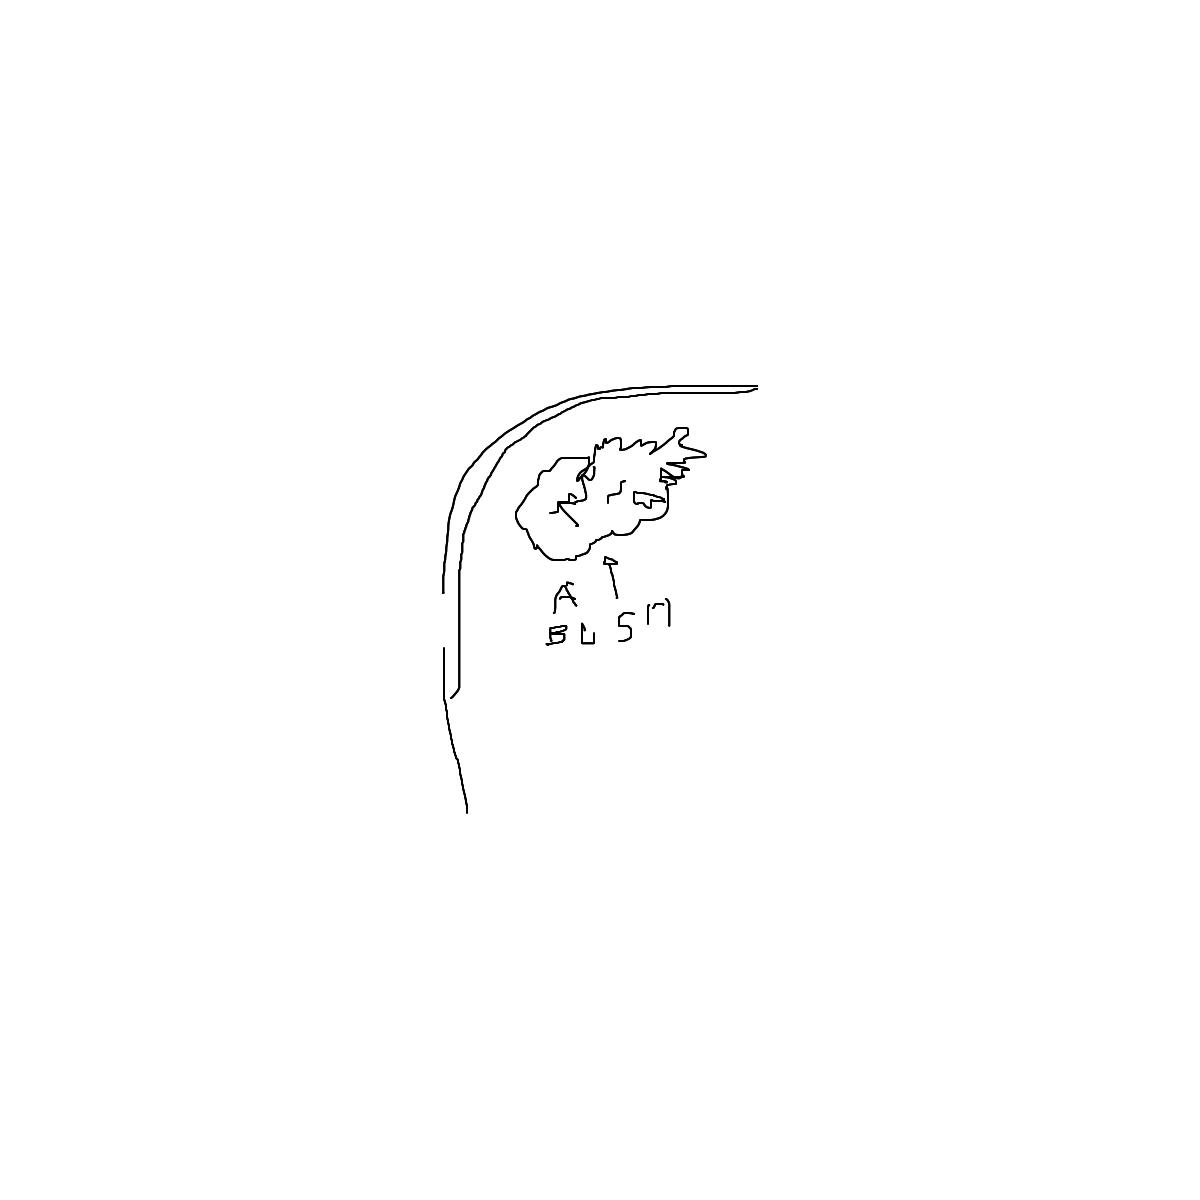 BAAAM drawing#23107 lat:6.4517259597778320lng: 3.4300105571746826